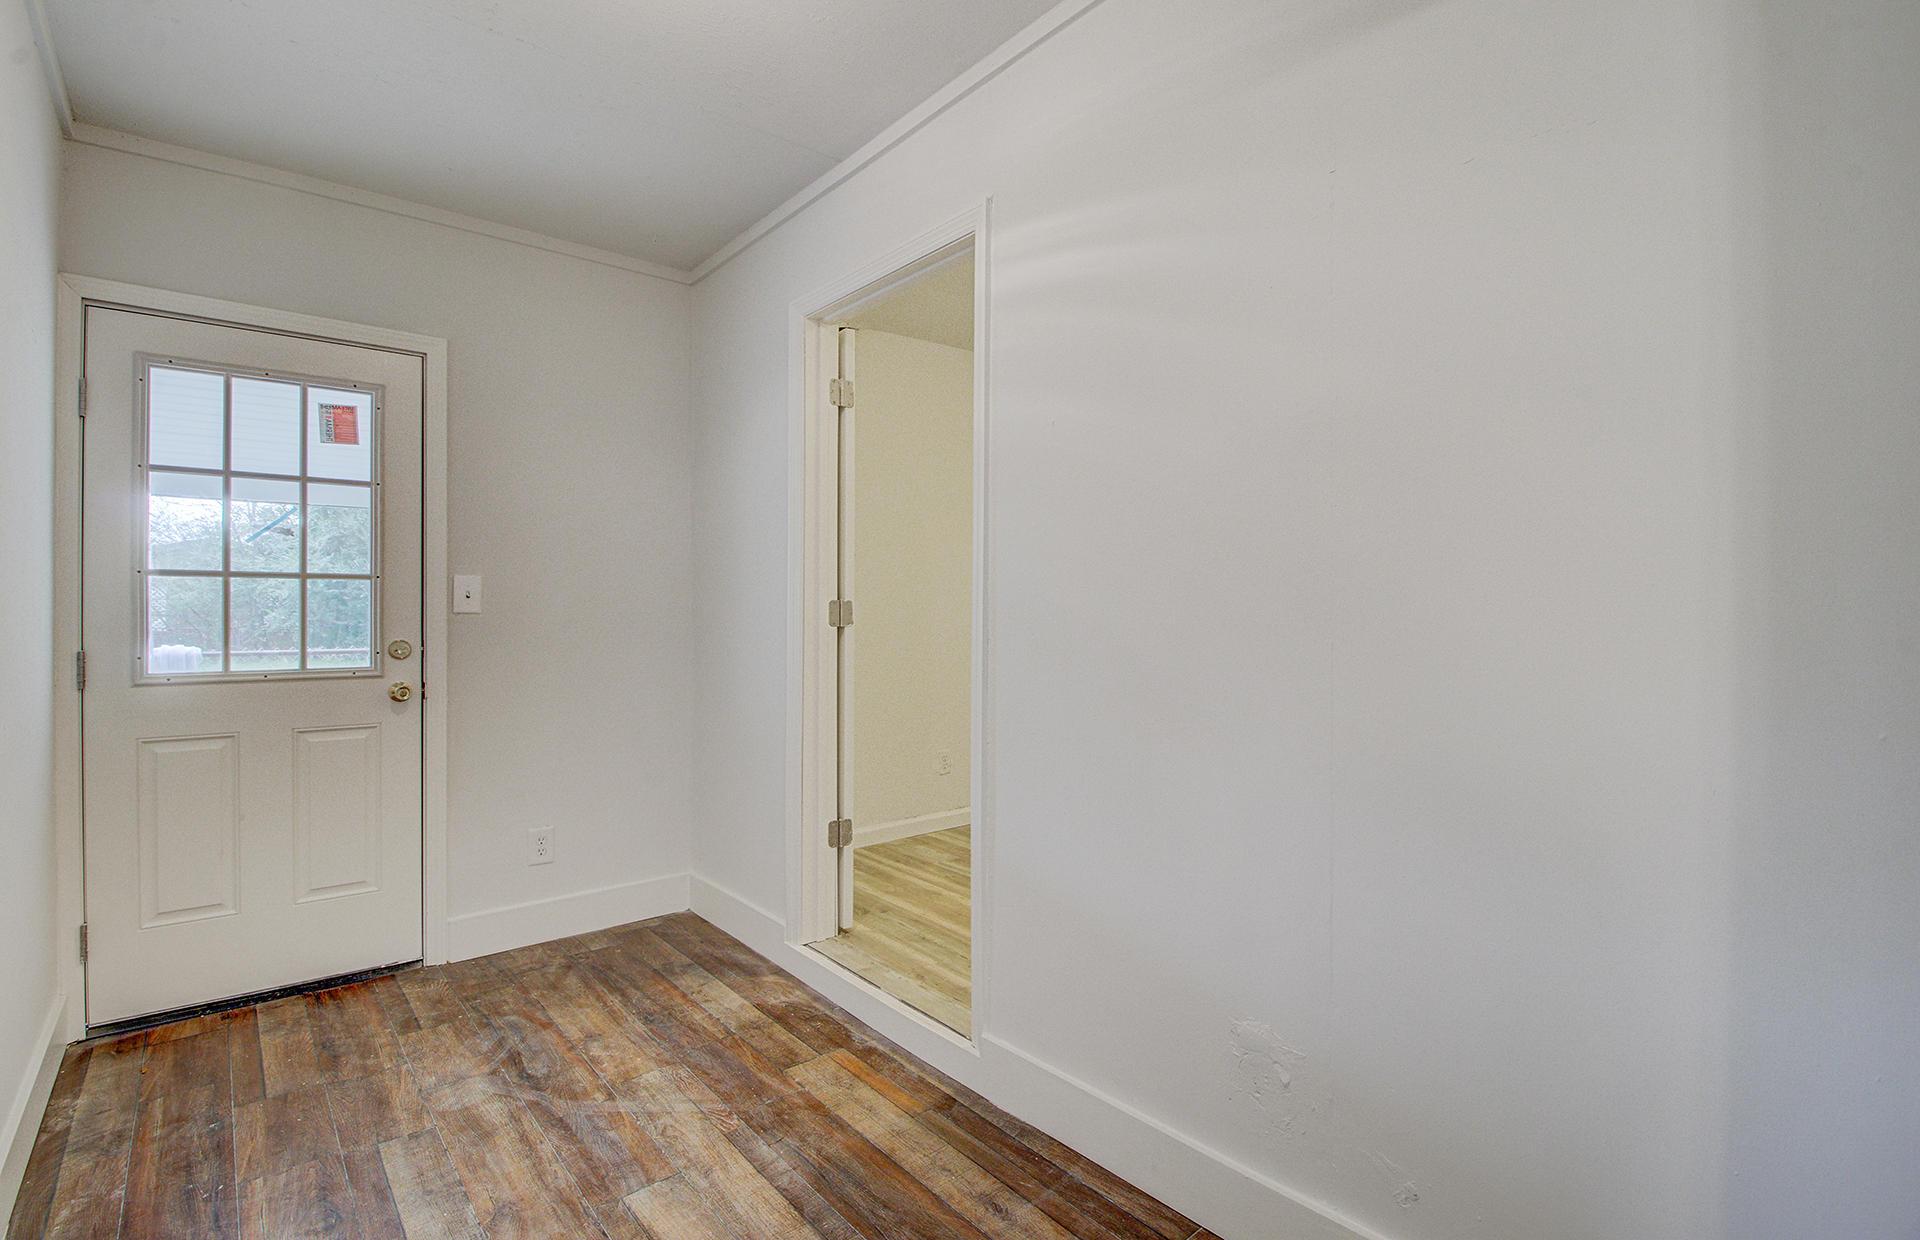 Sedgefield Section I Homes For Sale - 30 Aldene, Goose Creek, SC - 12